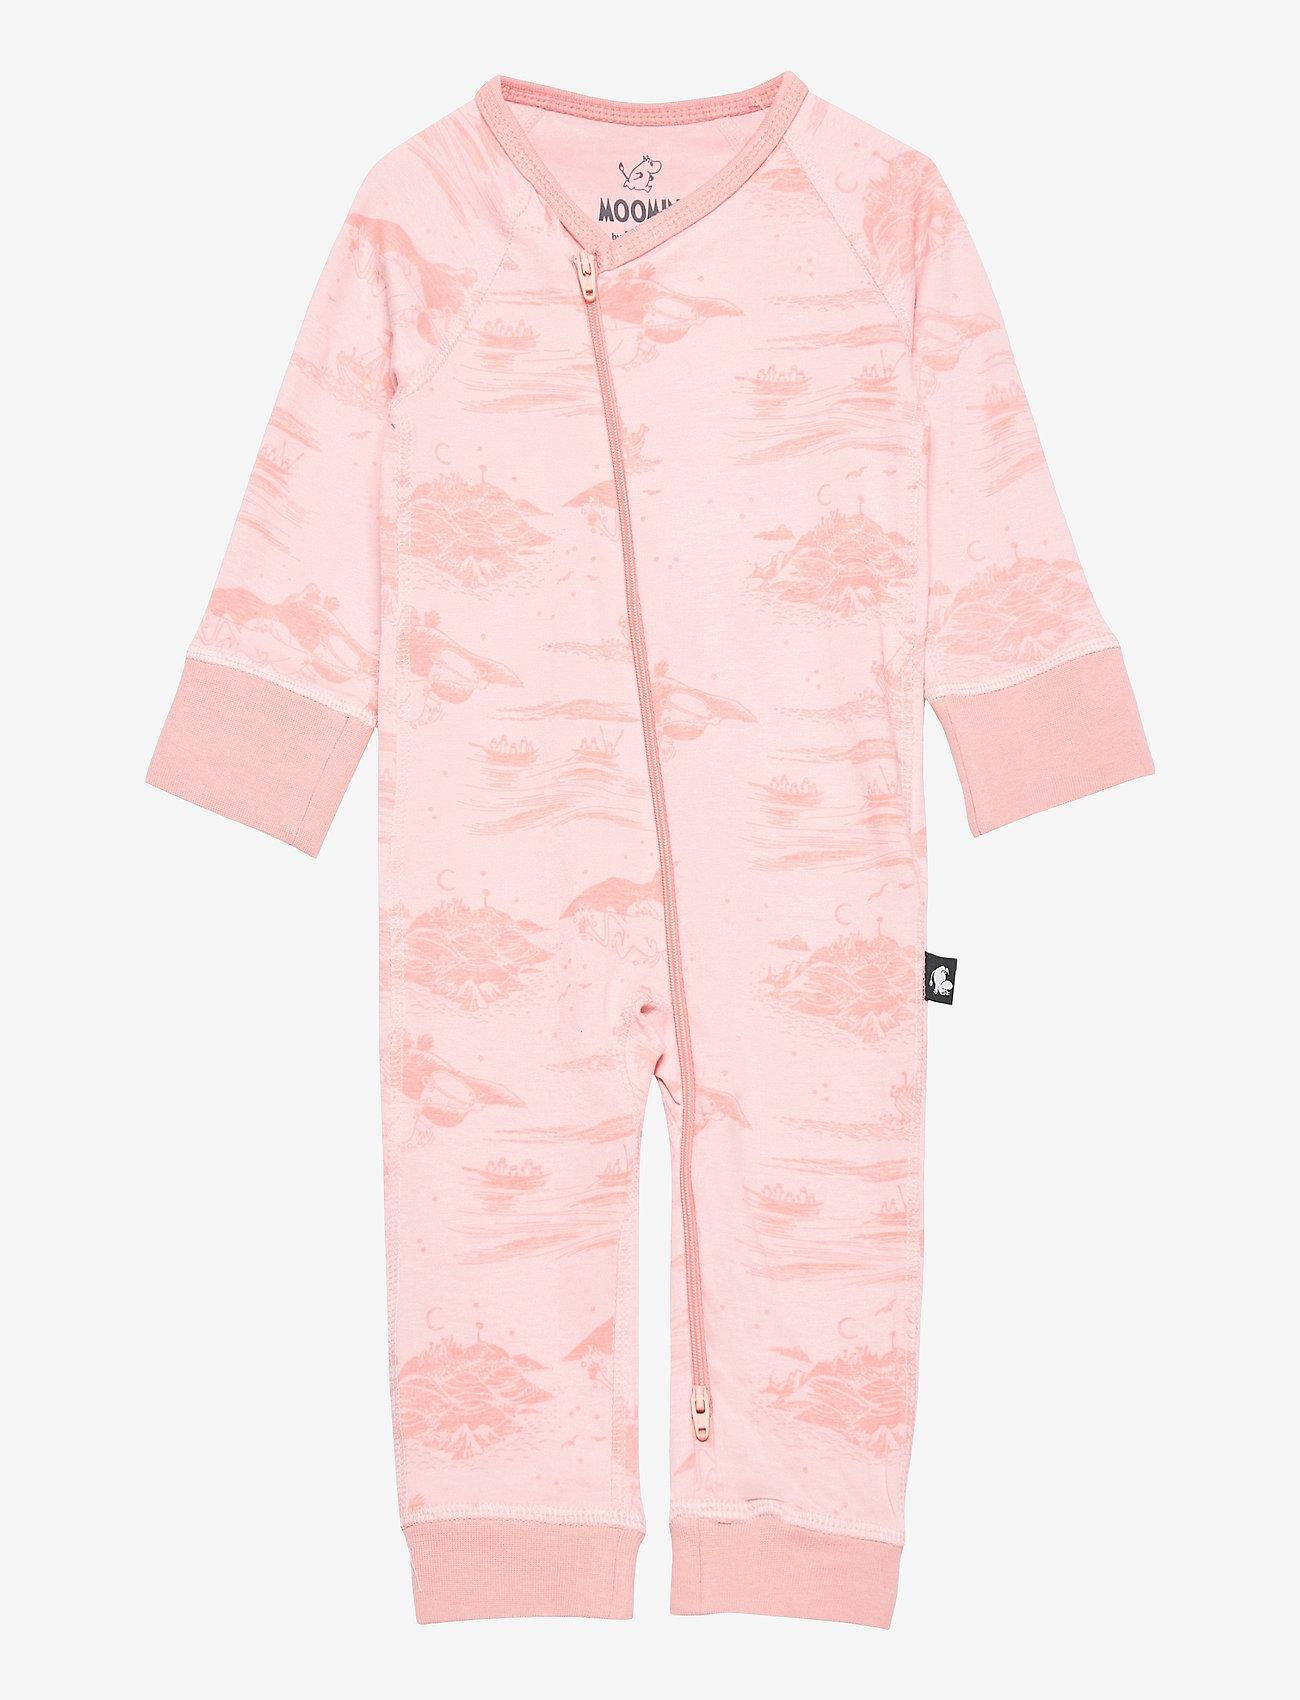 Reima - Moomin Trygg - langärmelig - light pink - 0